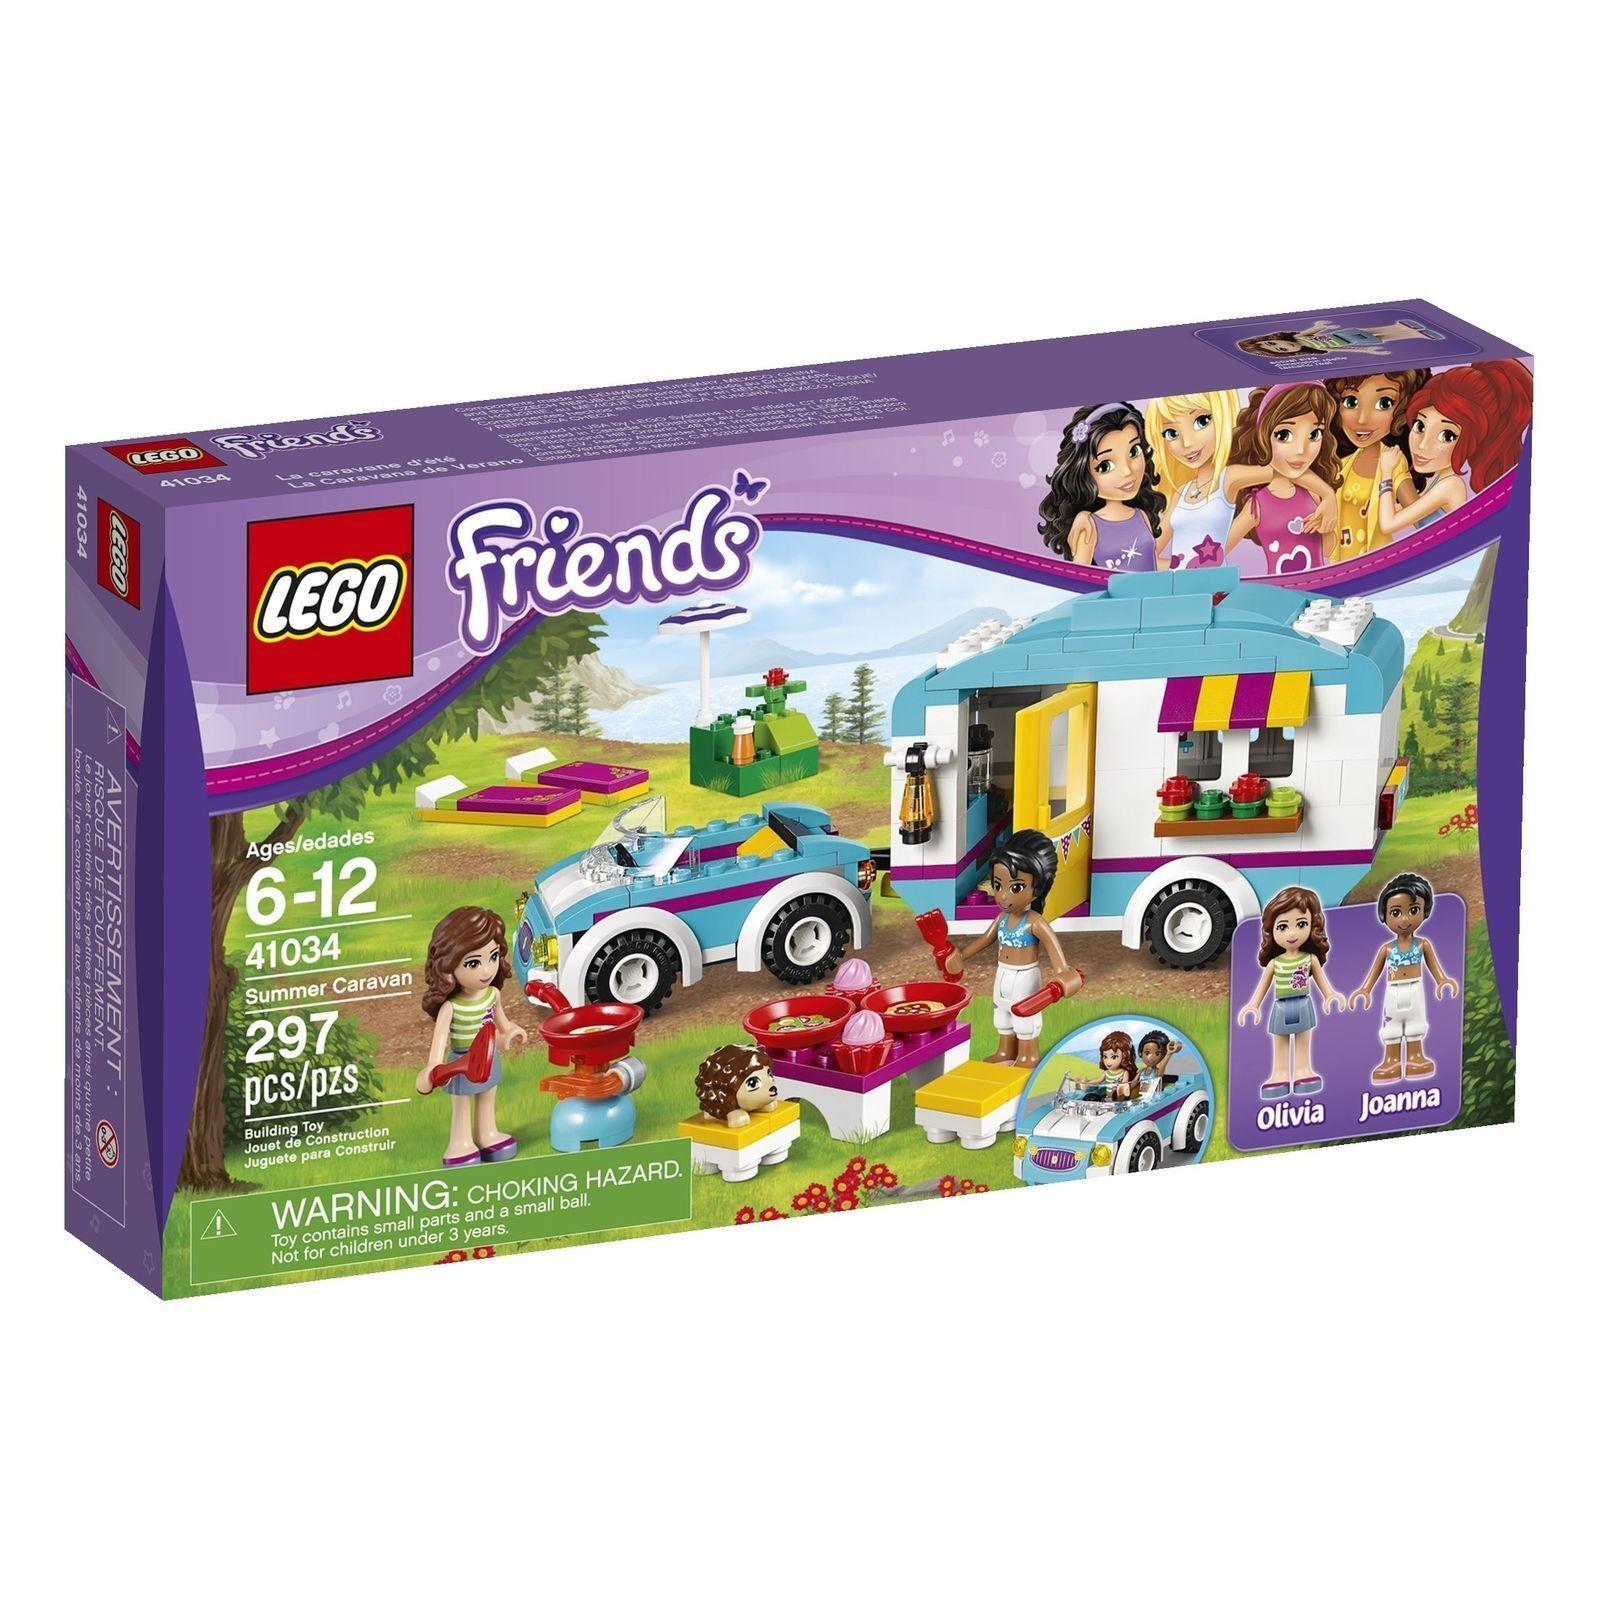 LEGOFRIENDSSummer  autoavan costruzione Set41034nuovoSEALED scatola   design unico